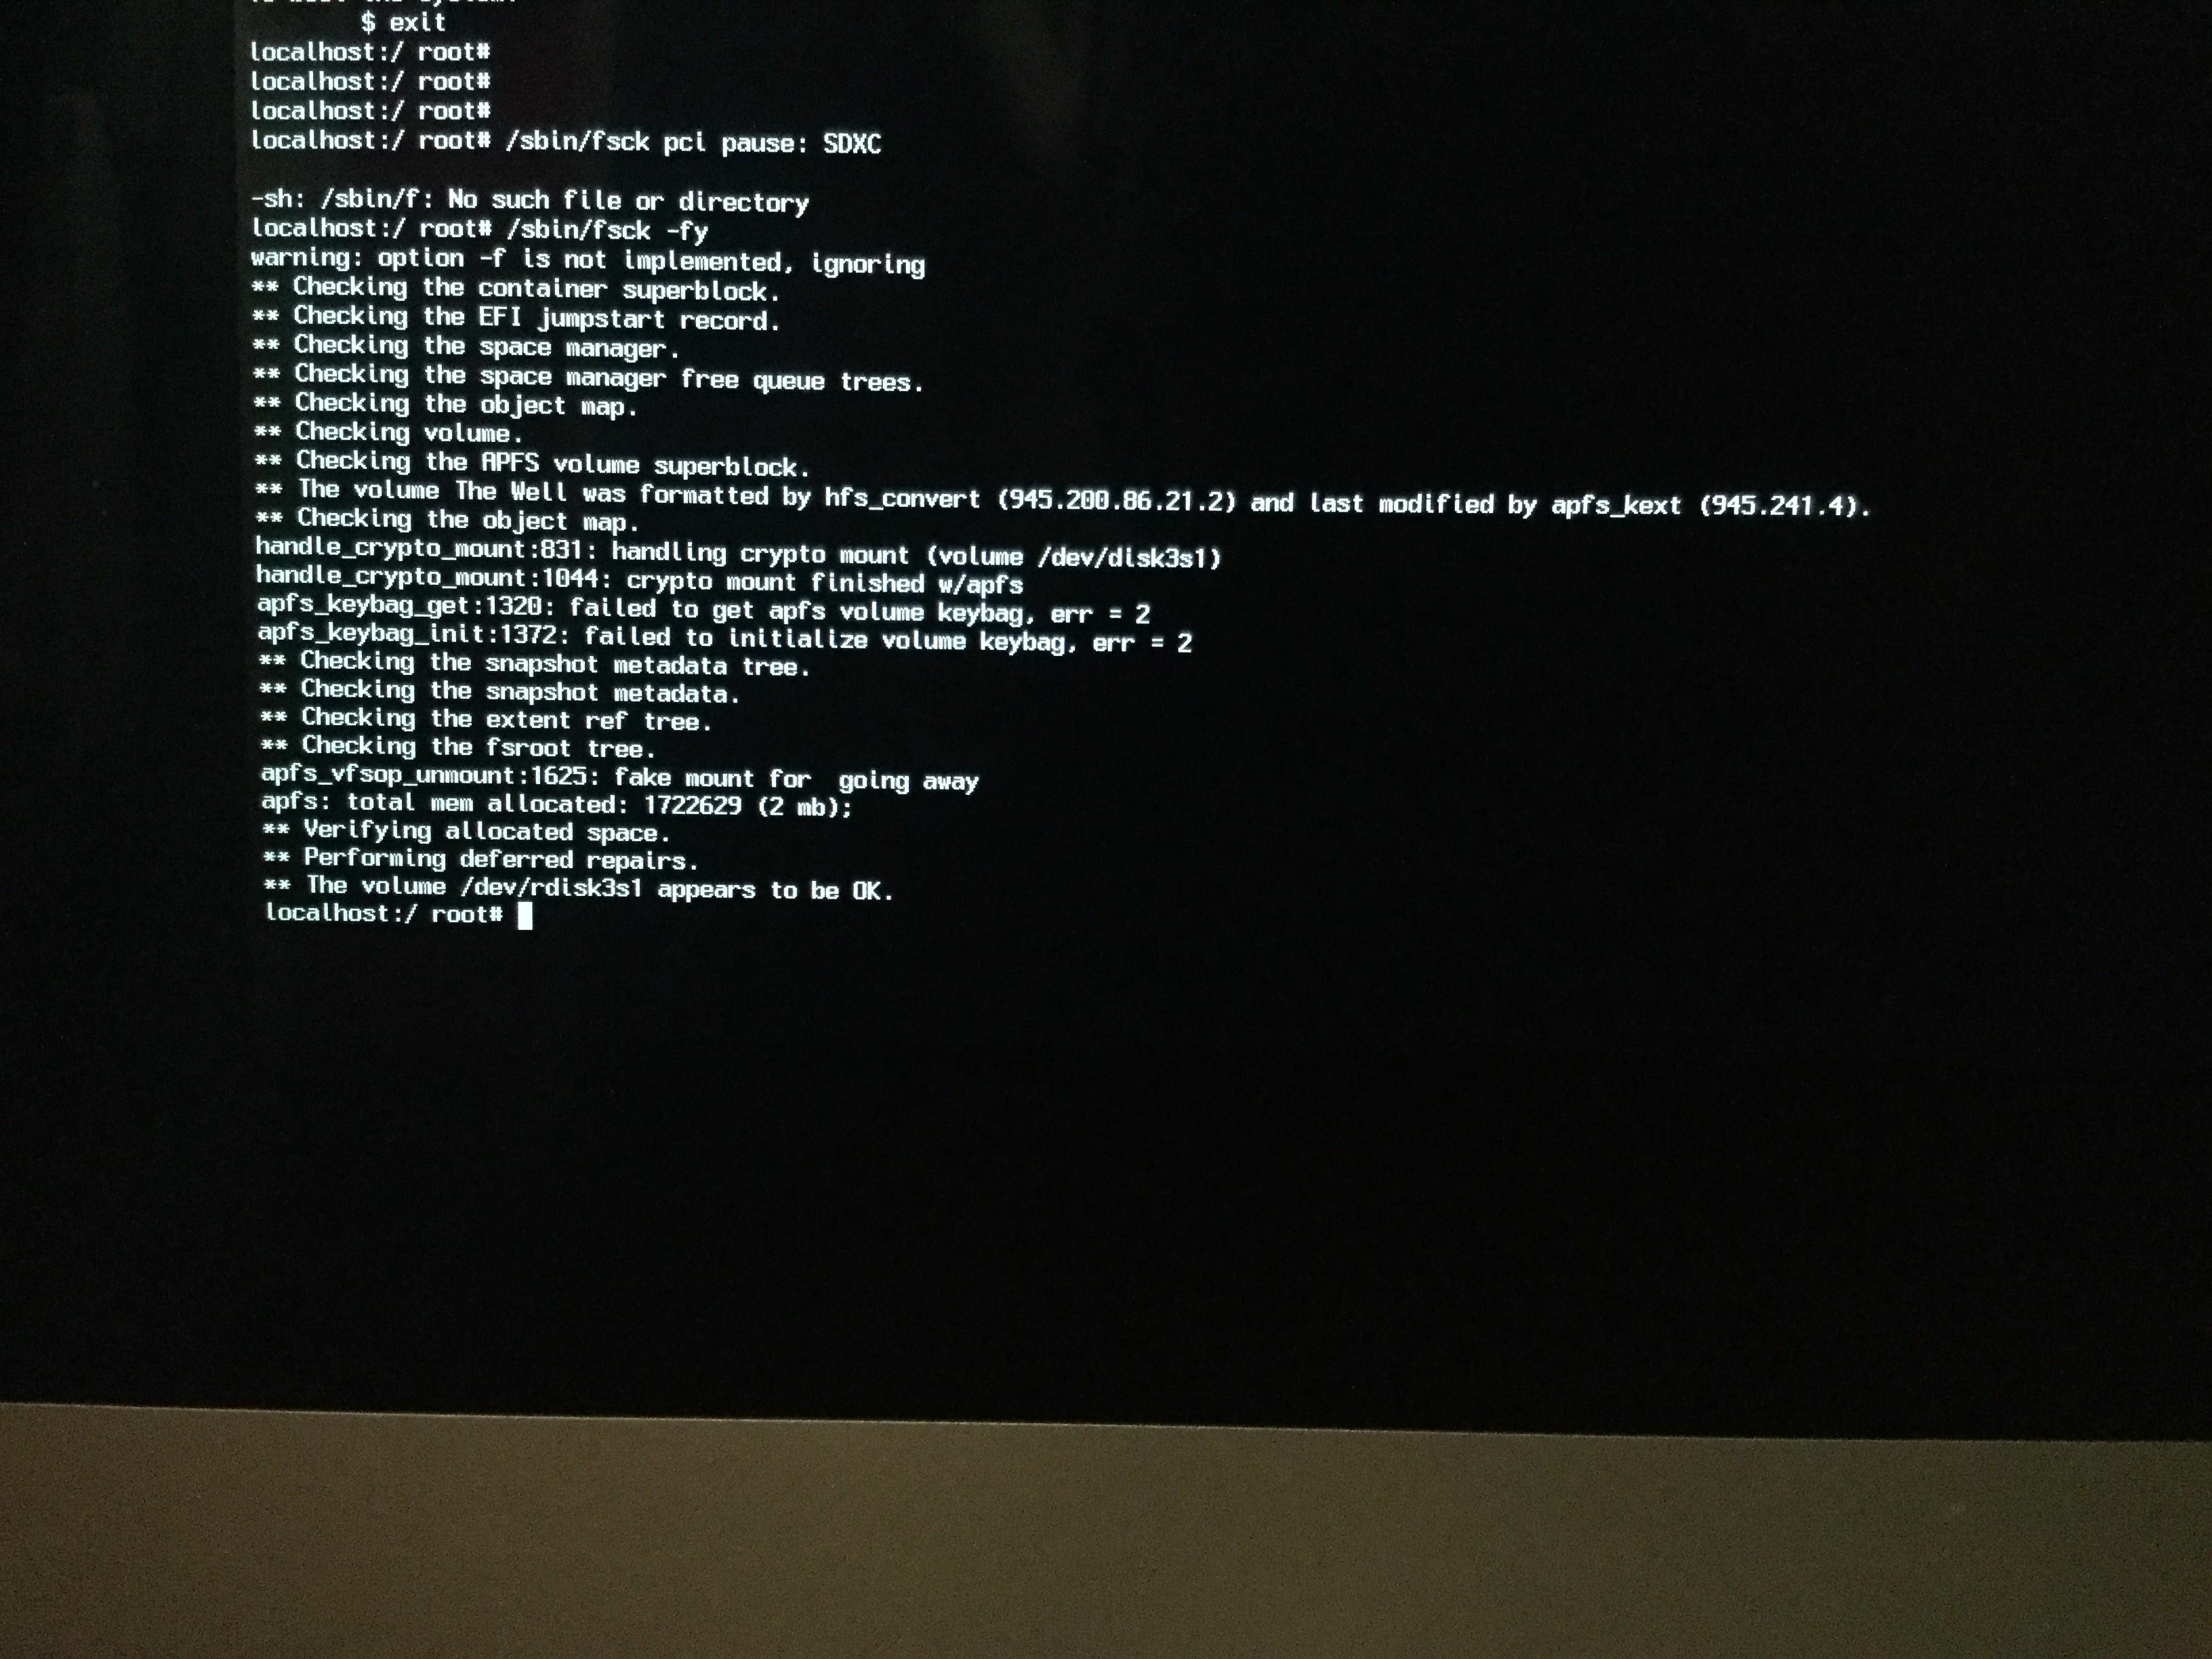 disk3s1 i/o error - Apple Community